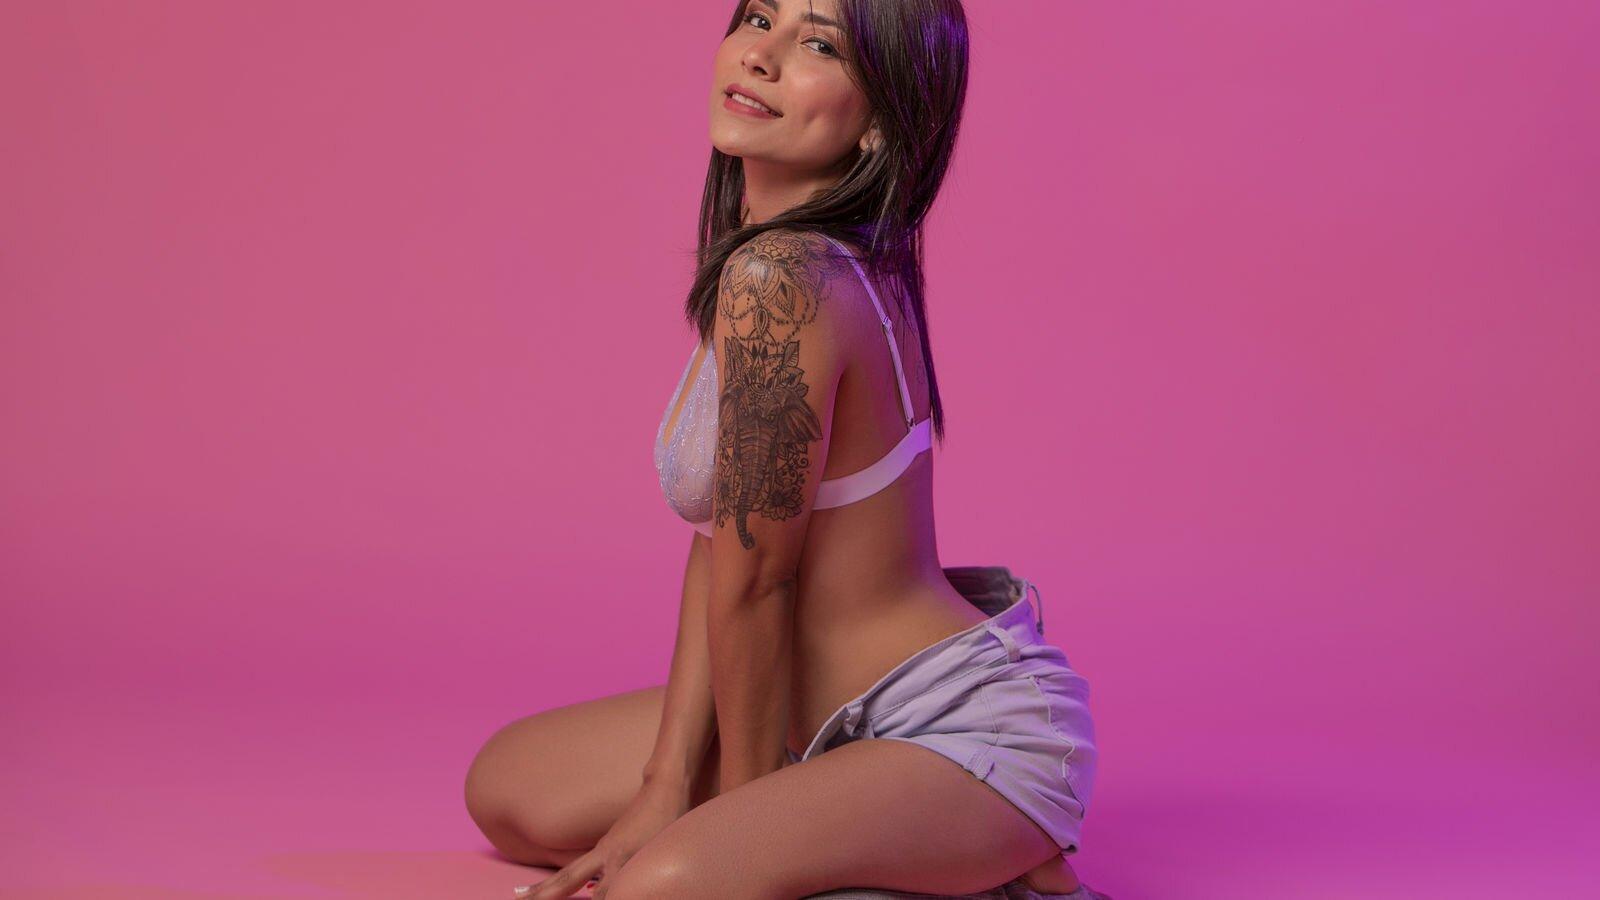 CamilleBale